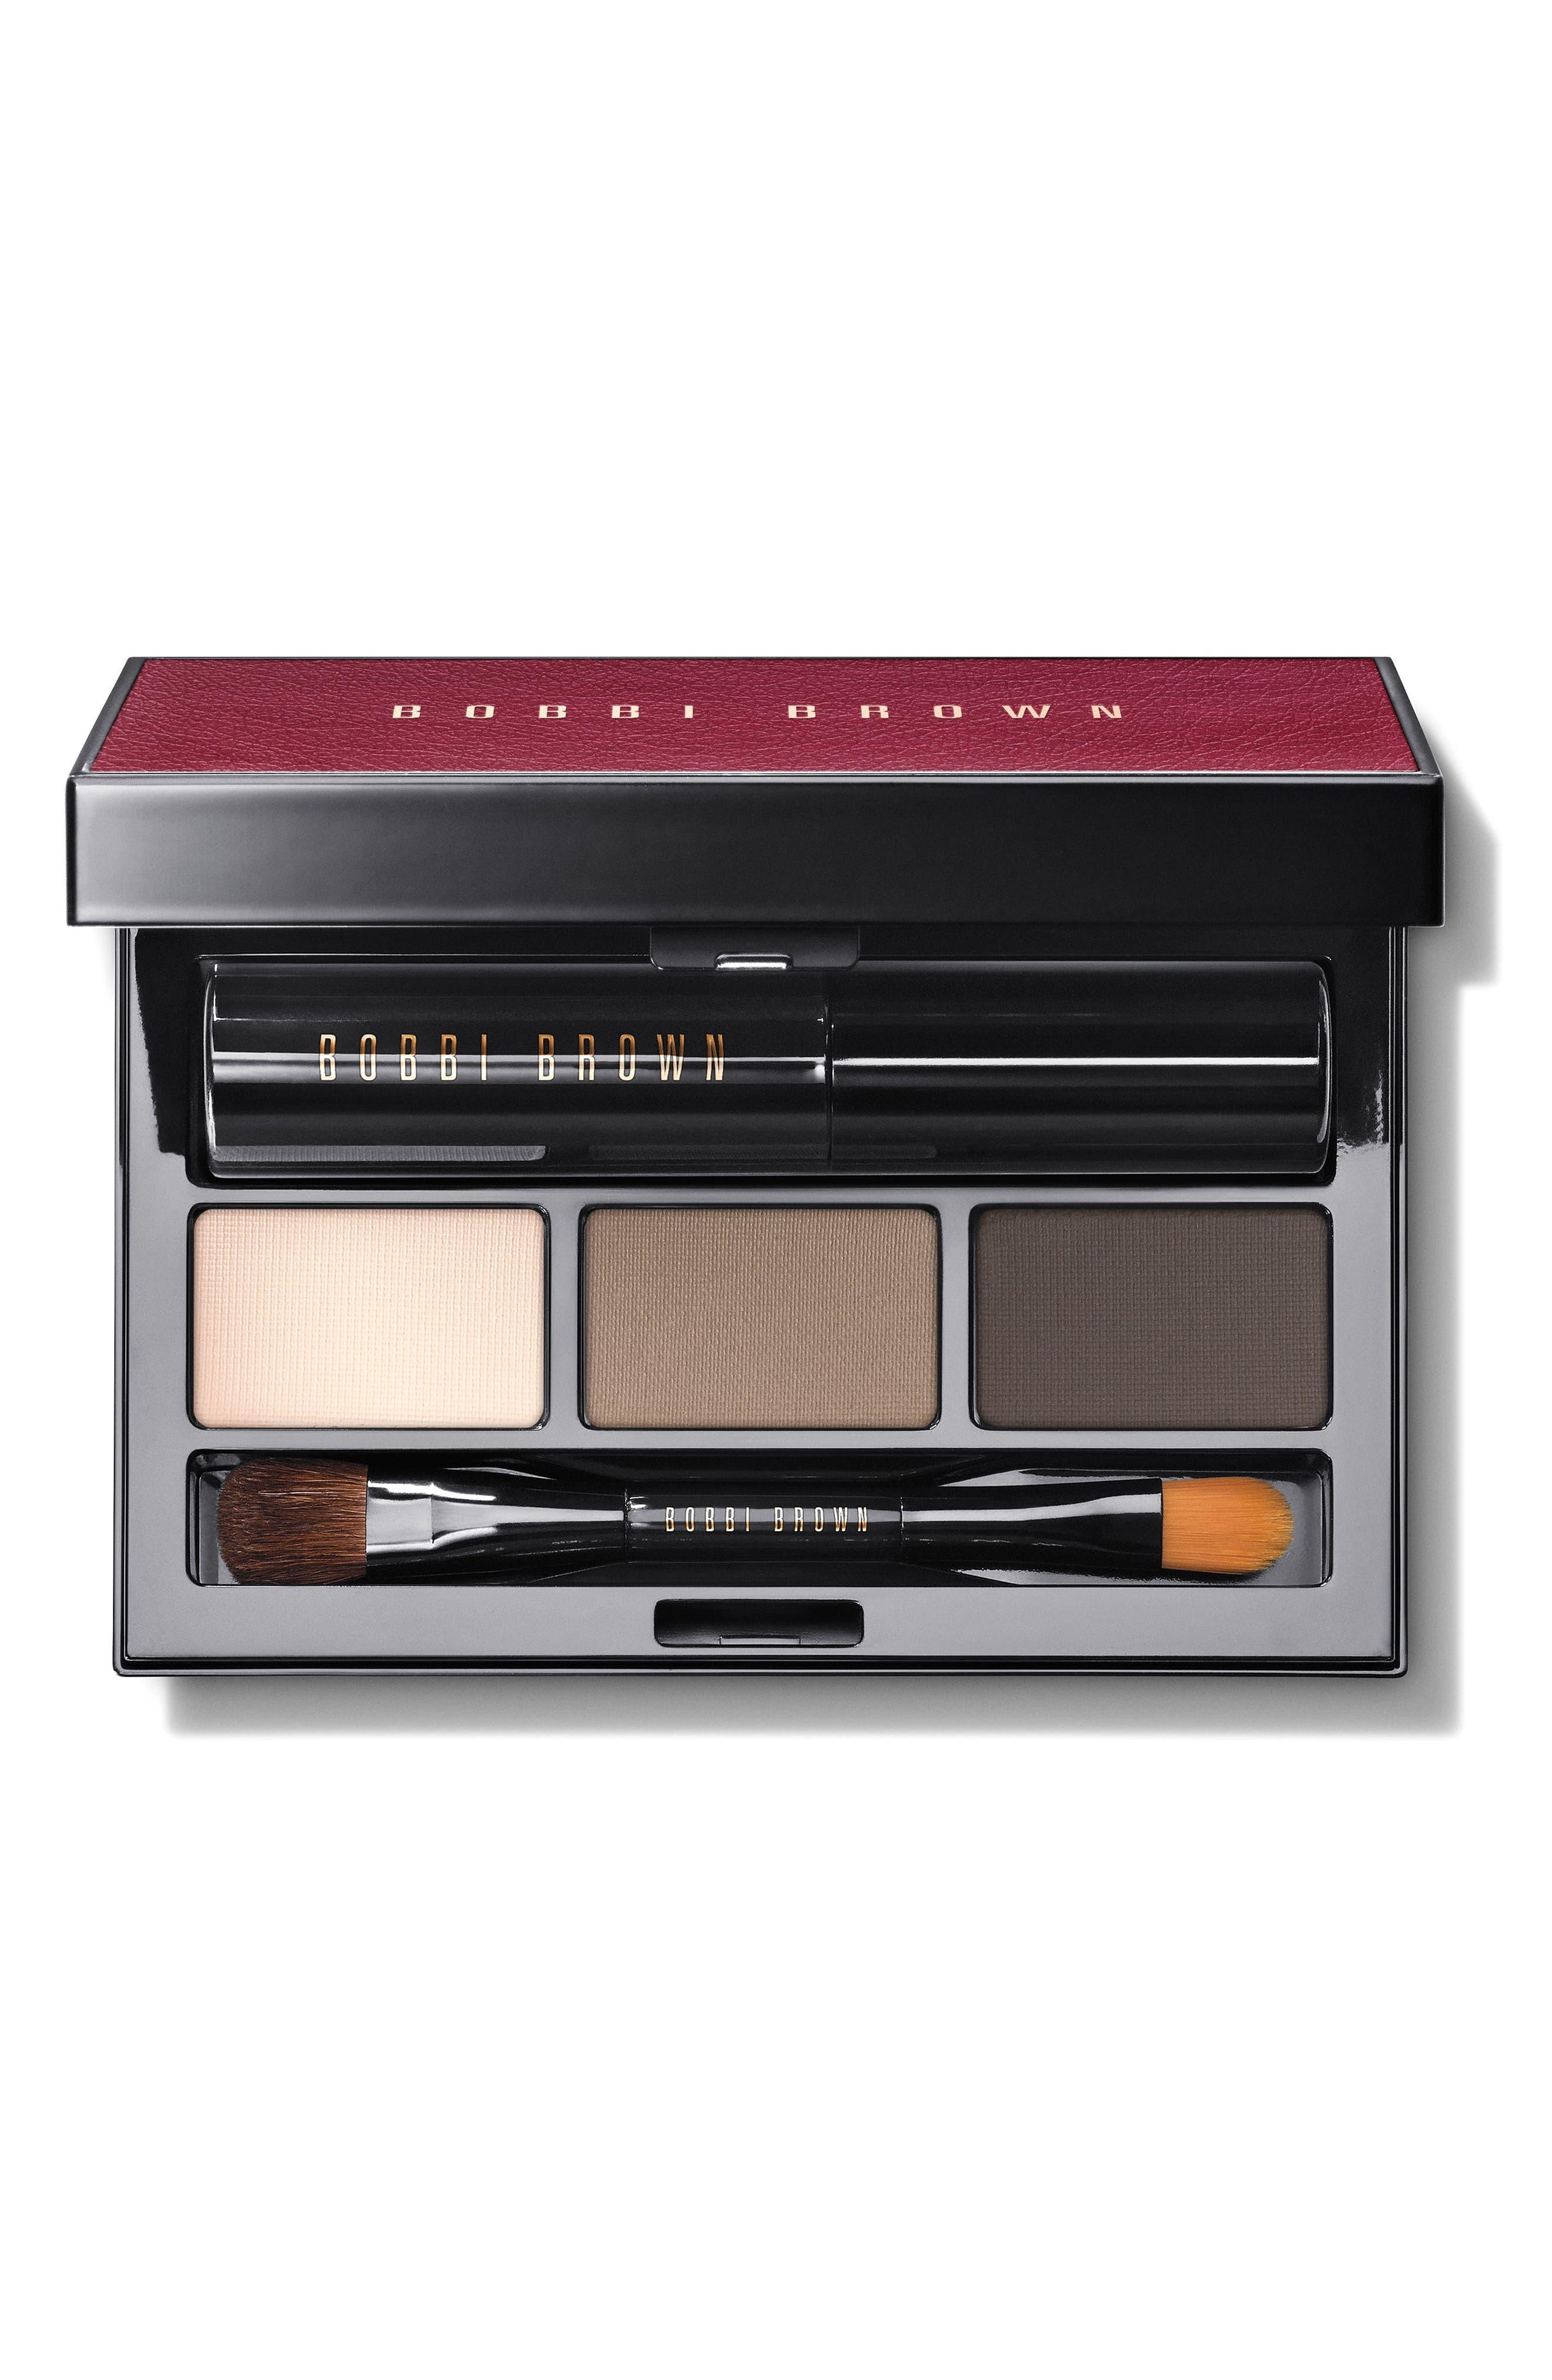 Main Image - Bobbi Brown Soft Smoky Shadow & Mascara Palette ($81 Value)